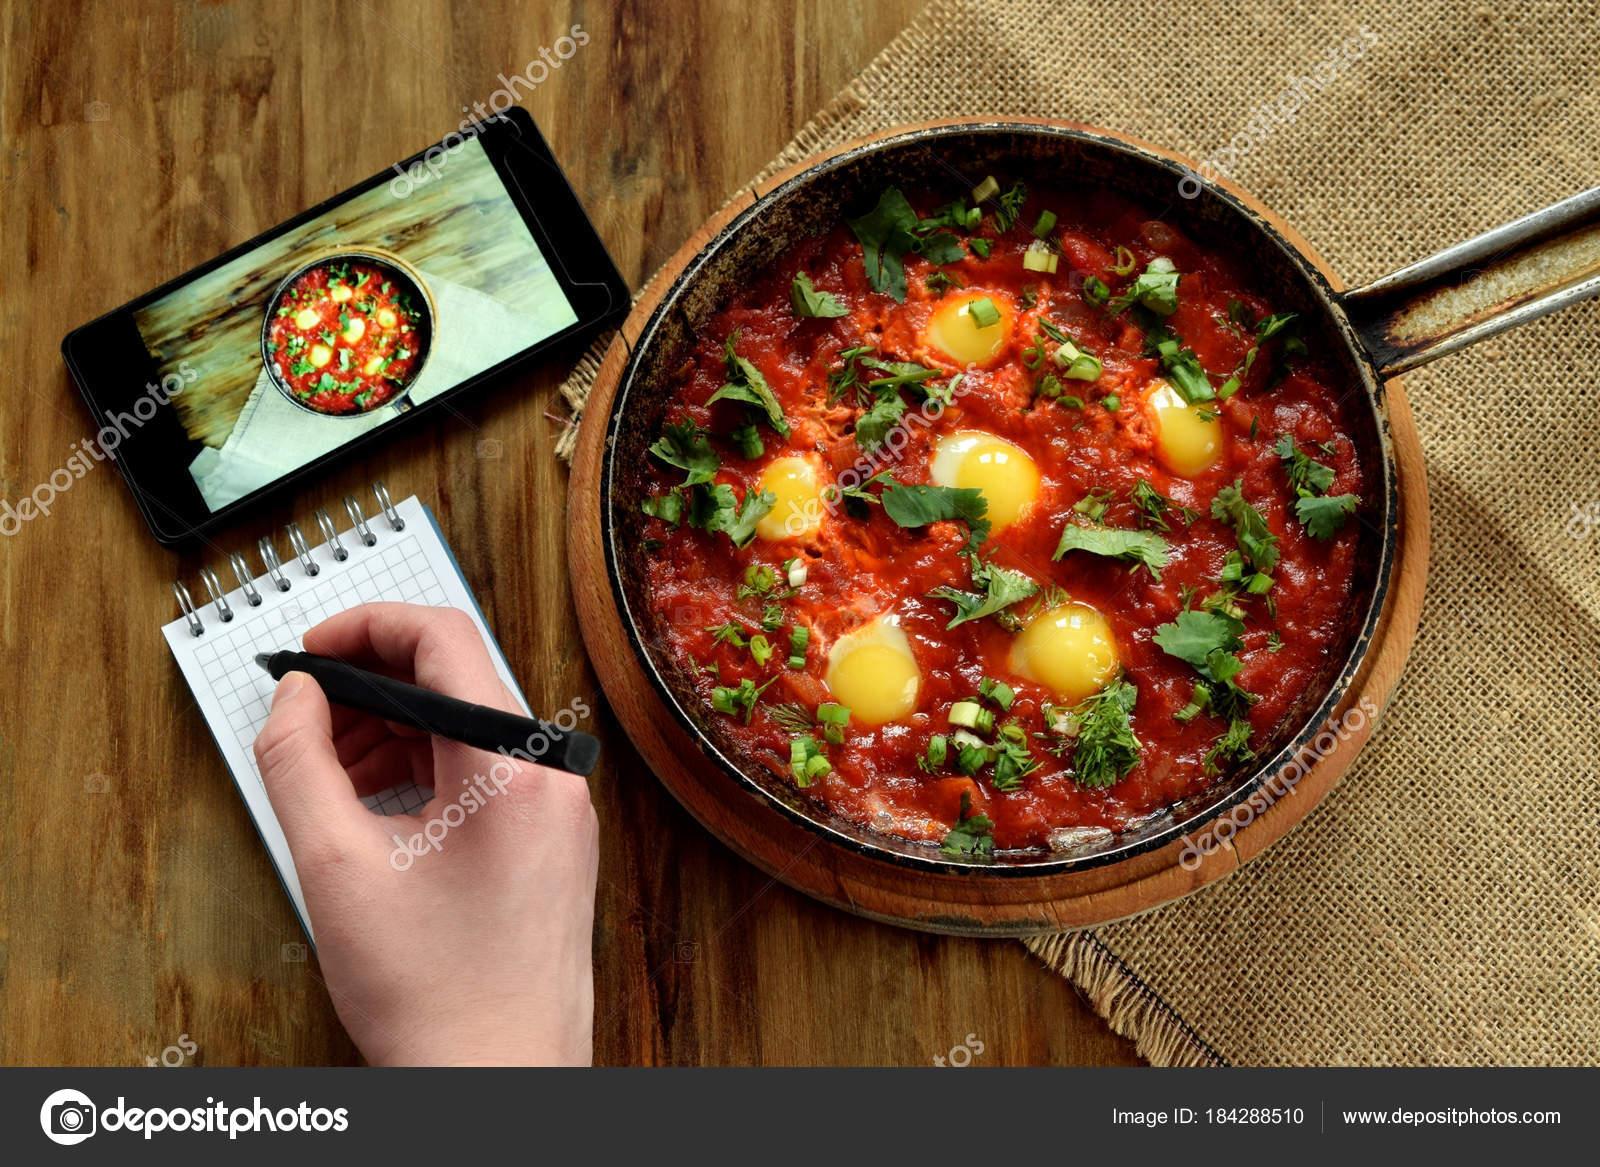 Fried Eggs Tomato Sauce Cast Iron Pan Smartphone Next Woman